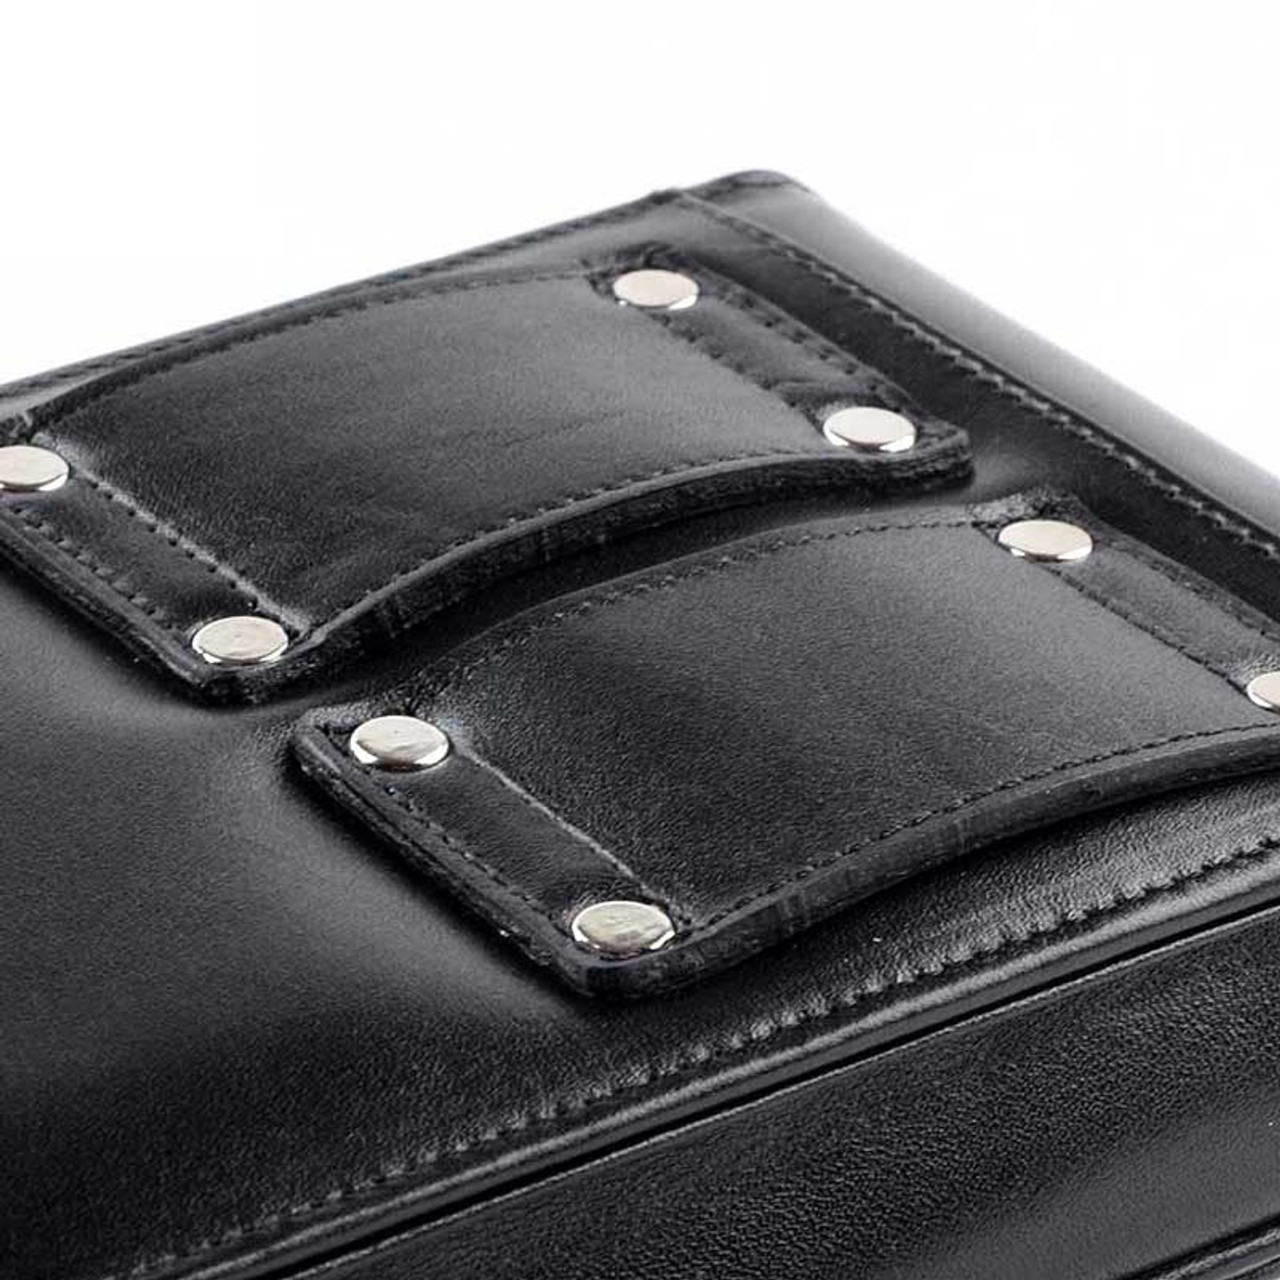 Walther PPK/S Concealed Carry Holster (Belt Loop)